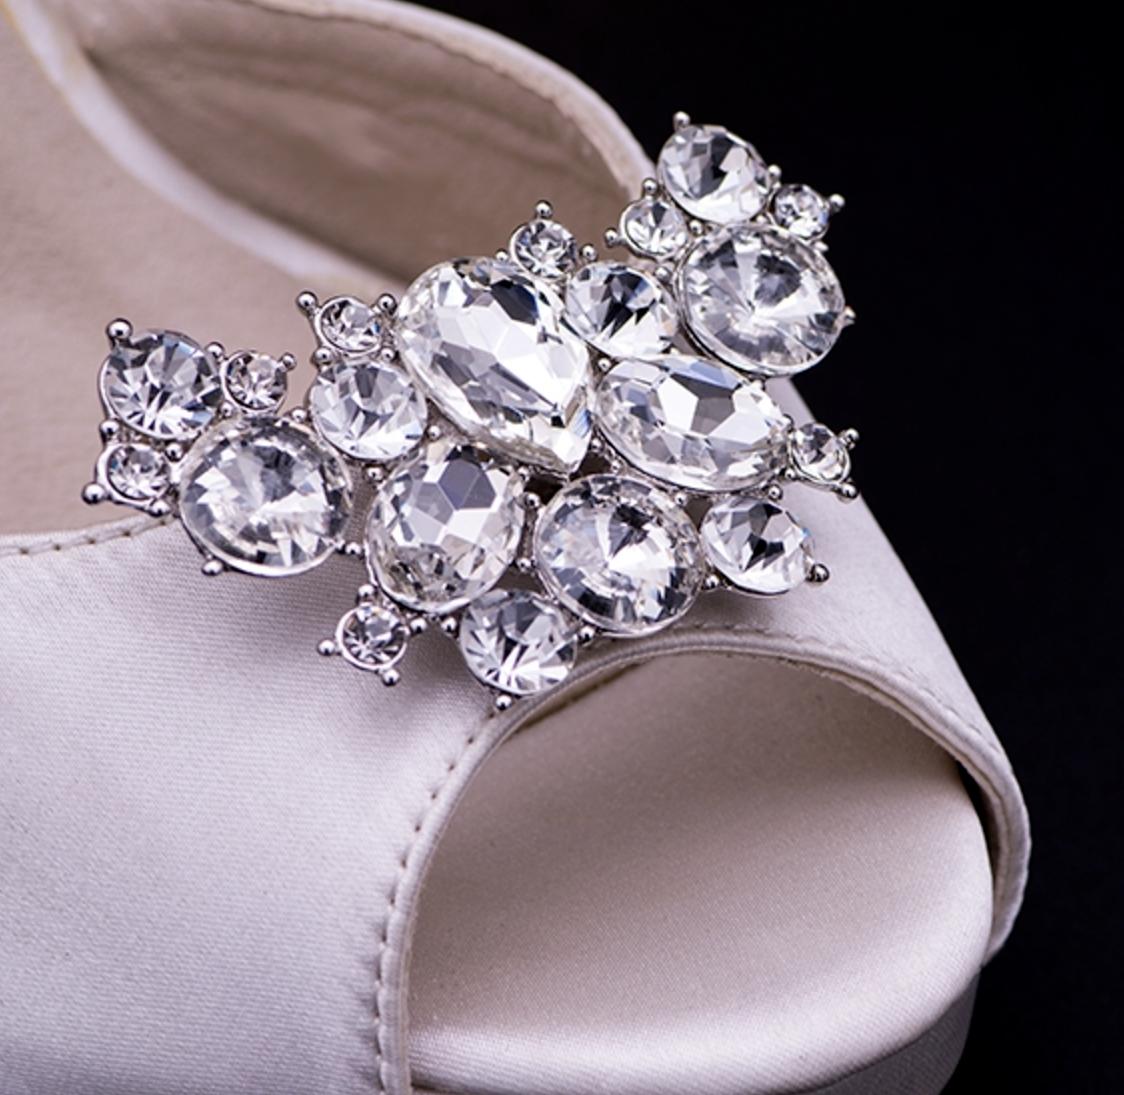 2 Pcs Rhinestone Crystal Flower Shoe Clips Silver Shoes Charm Jewellry